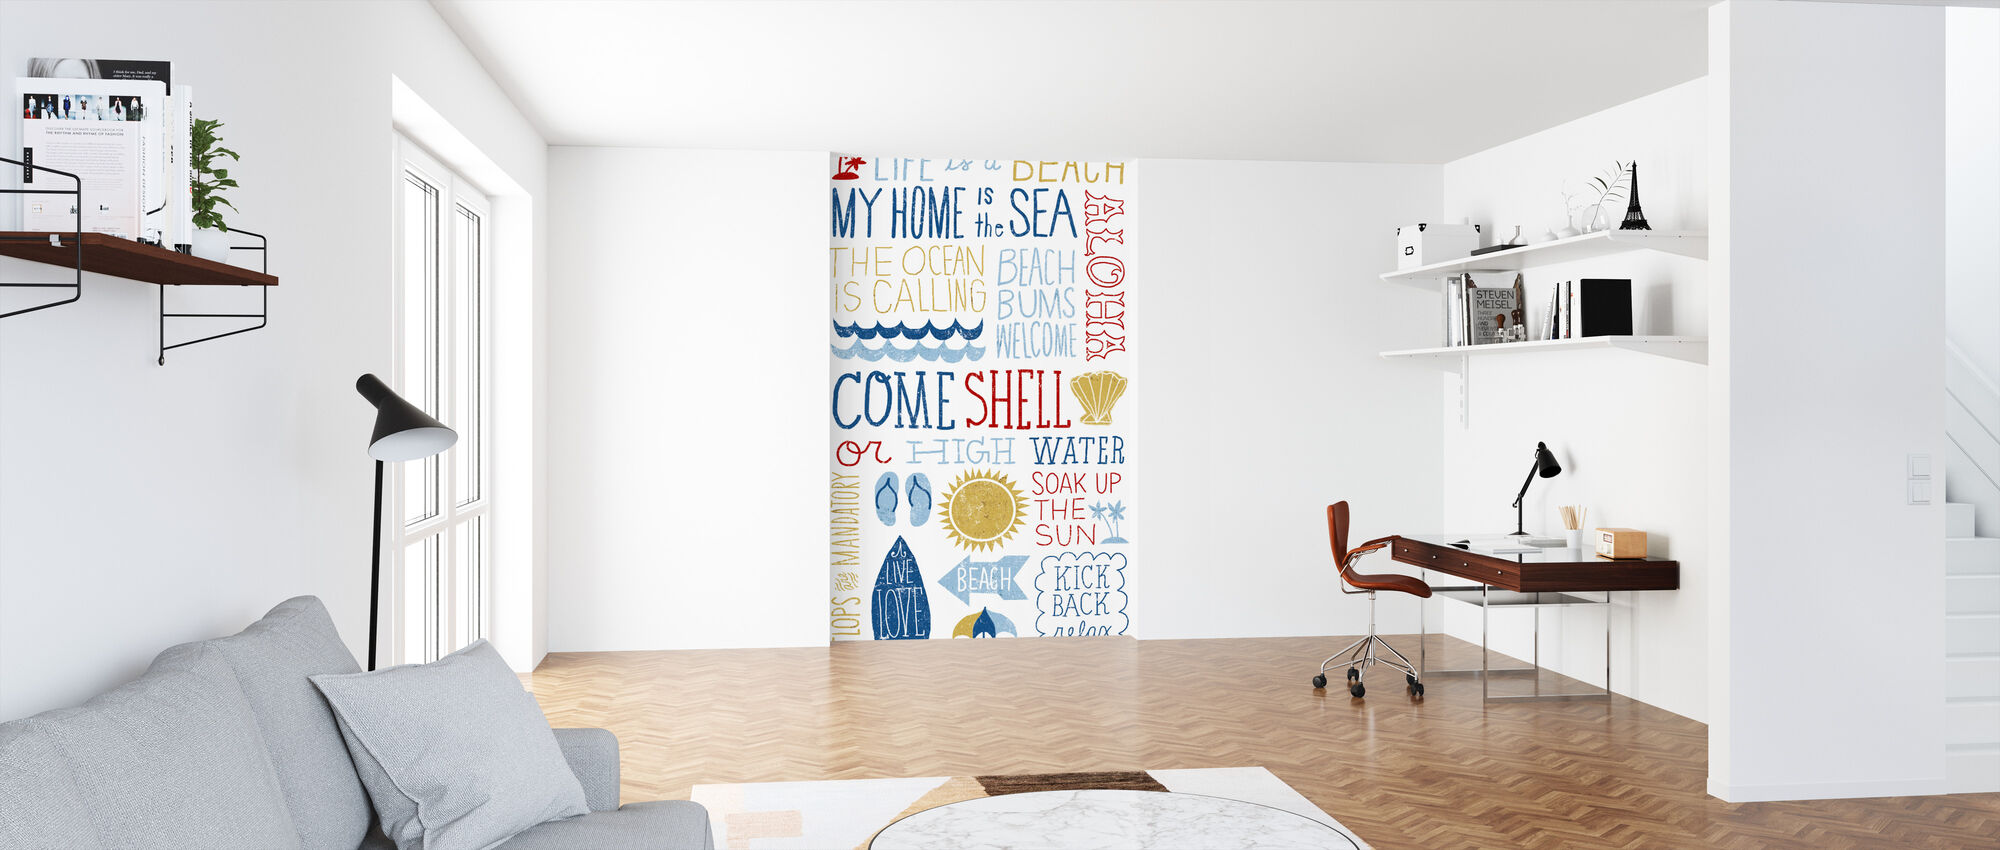 Fun in the Sun - Wallpaper - Office